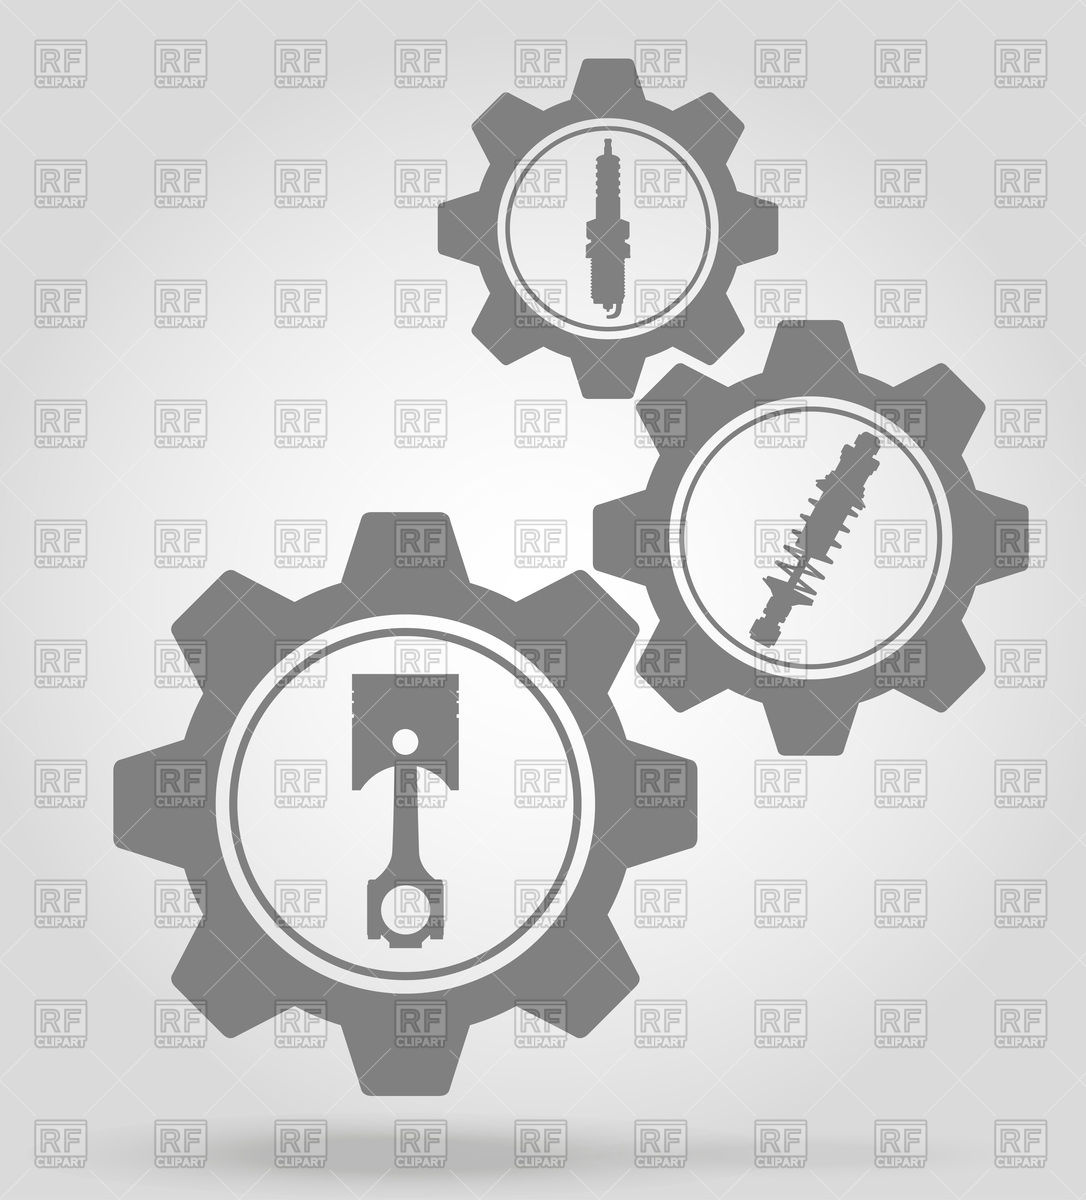 Car parts gear icons Vector Image #96860.